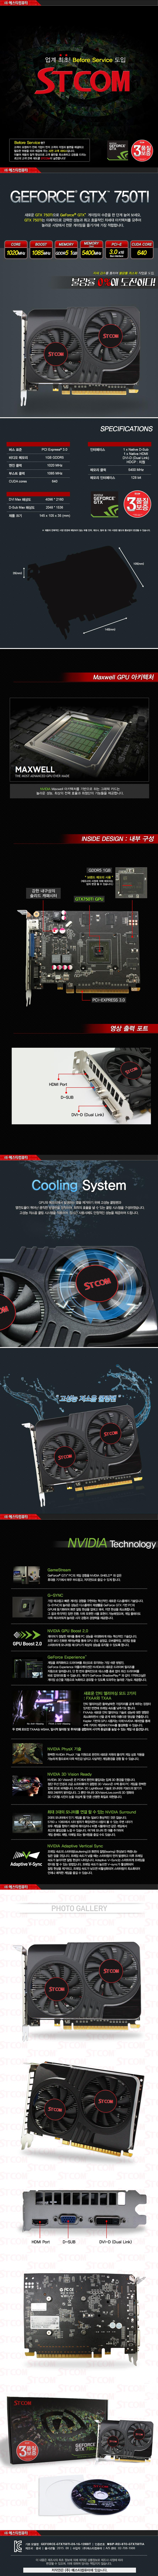 st750TI